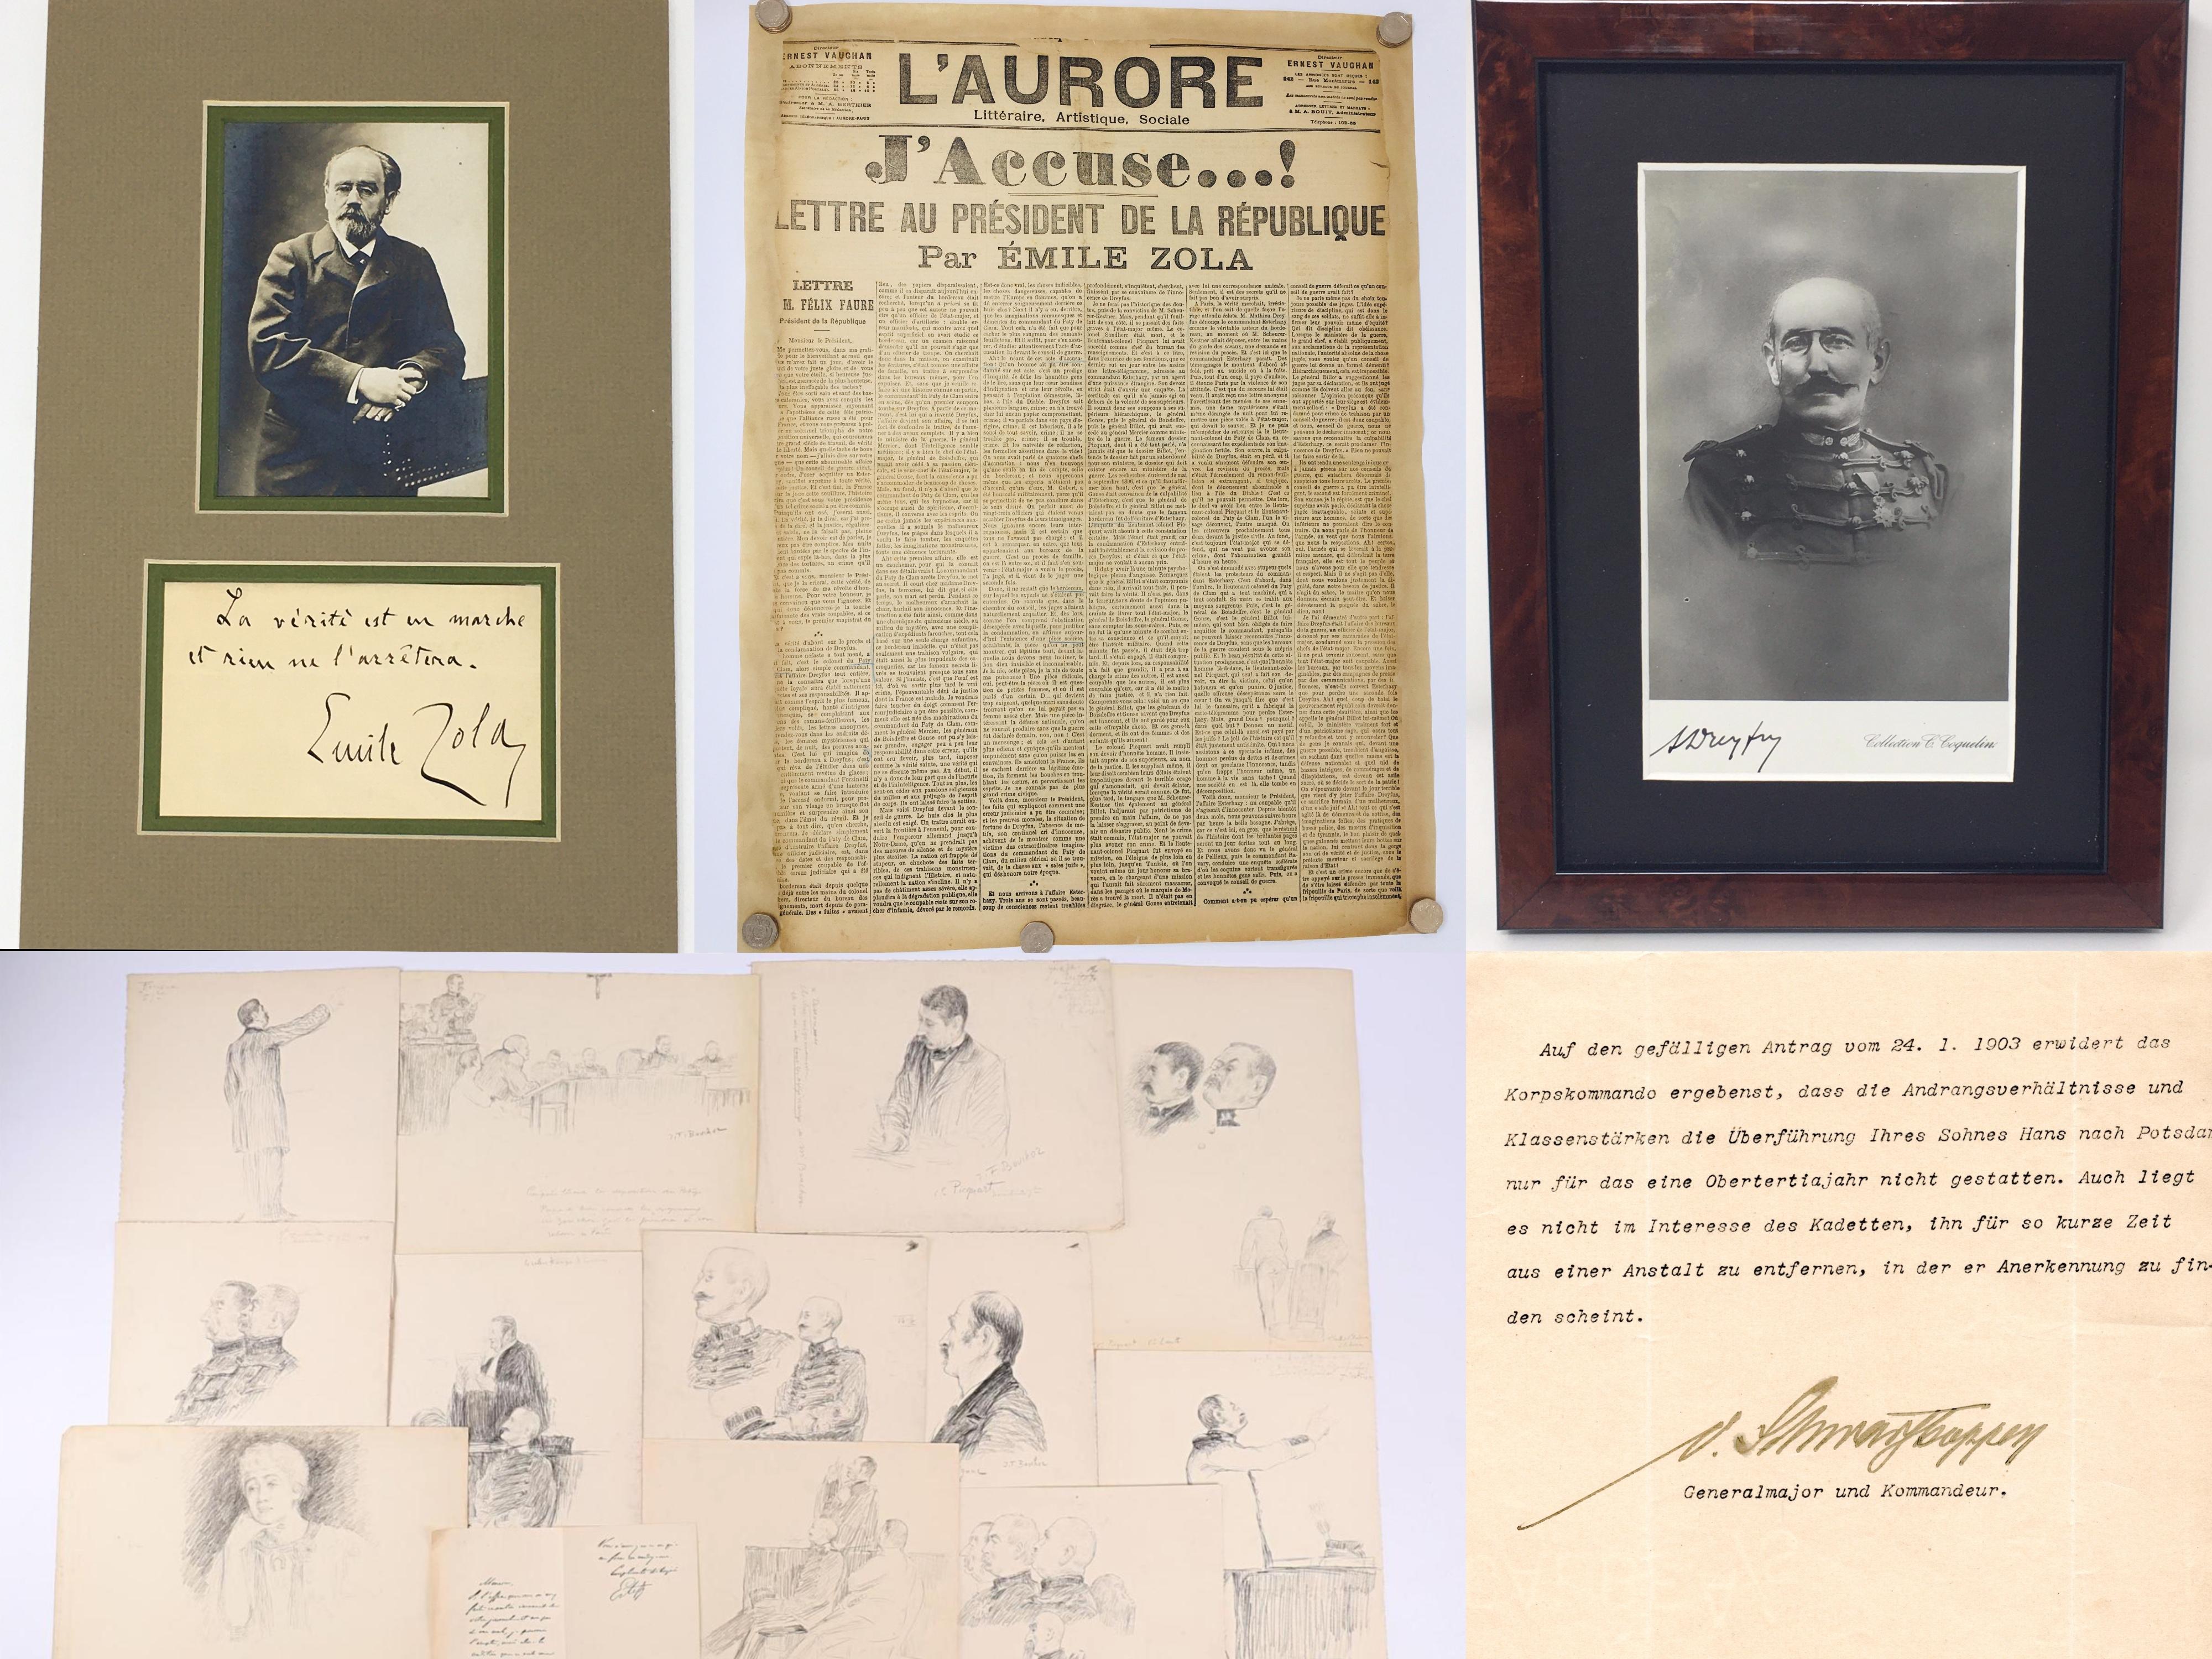 J'Accuse Newspaper, Emile Zola Quote, Signed Dreyfus Portrait, Rare Trial Drawings & Schwartzkoppen